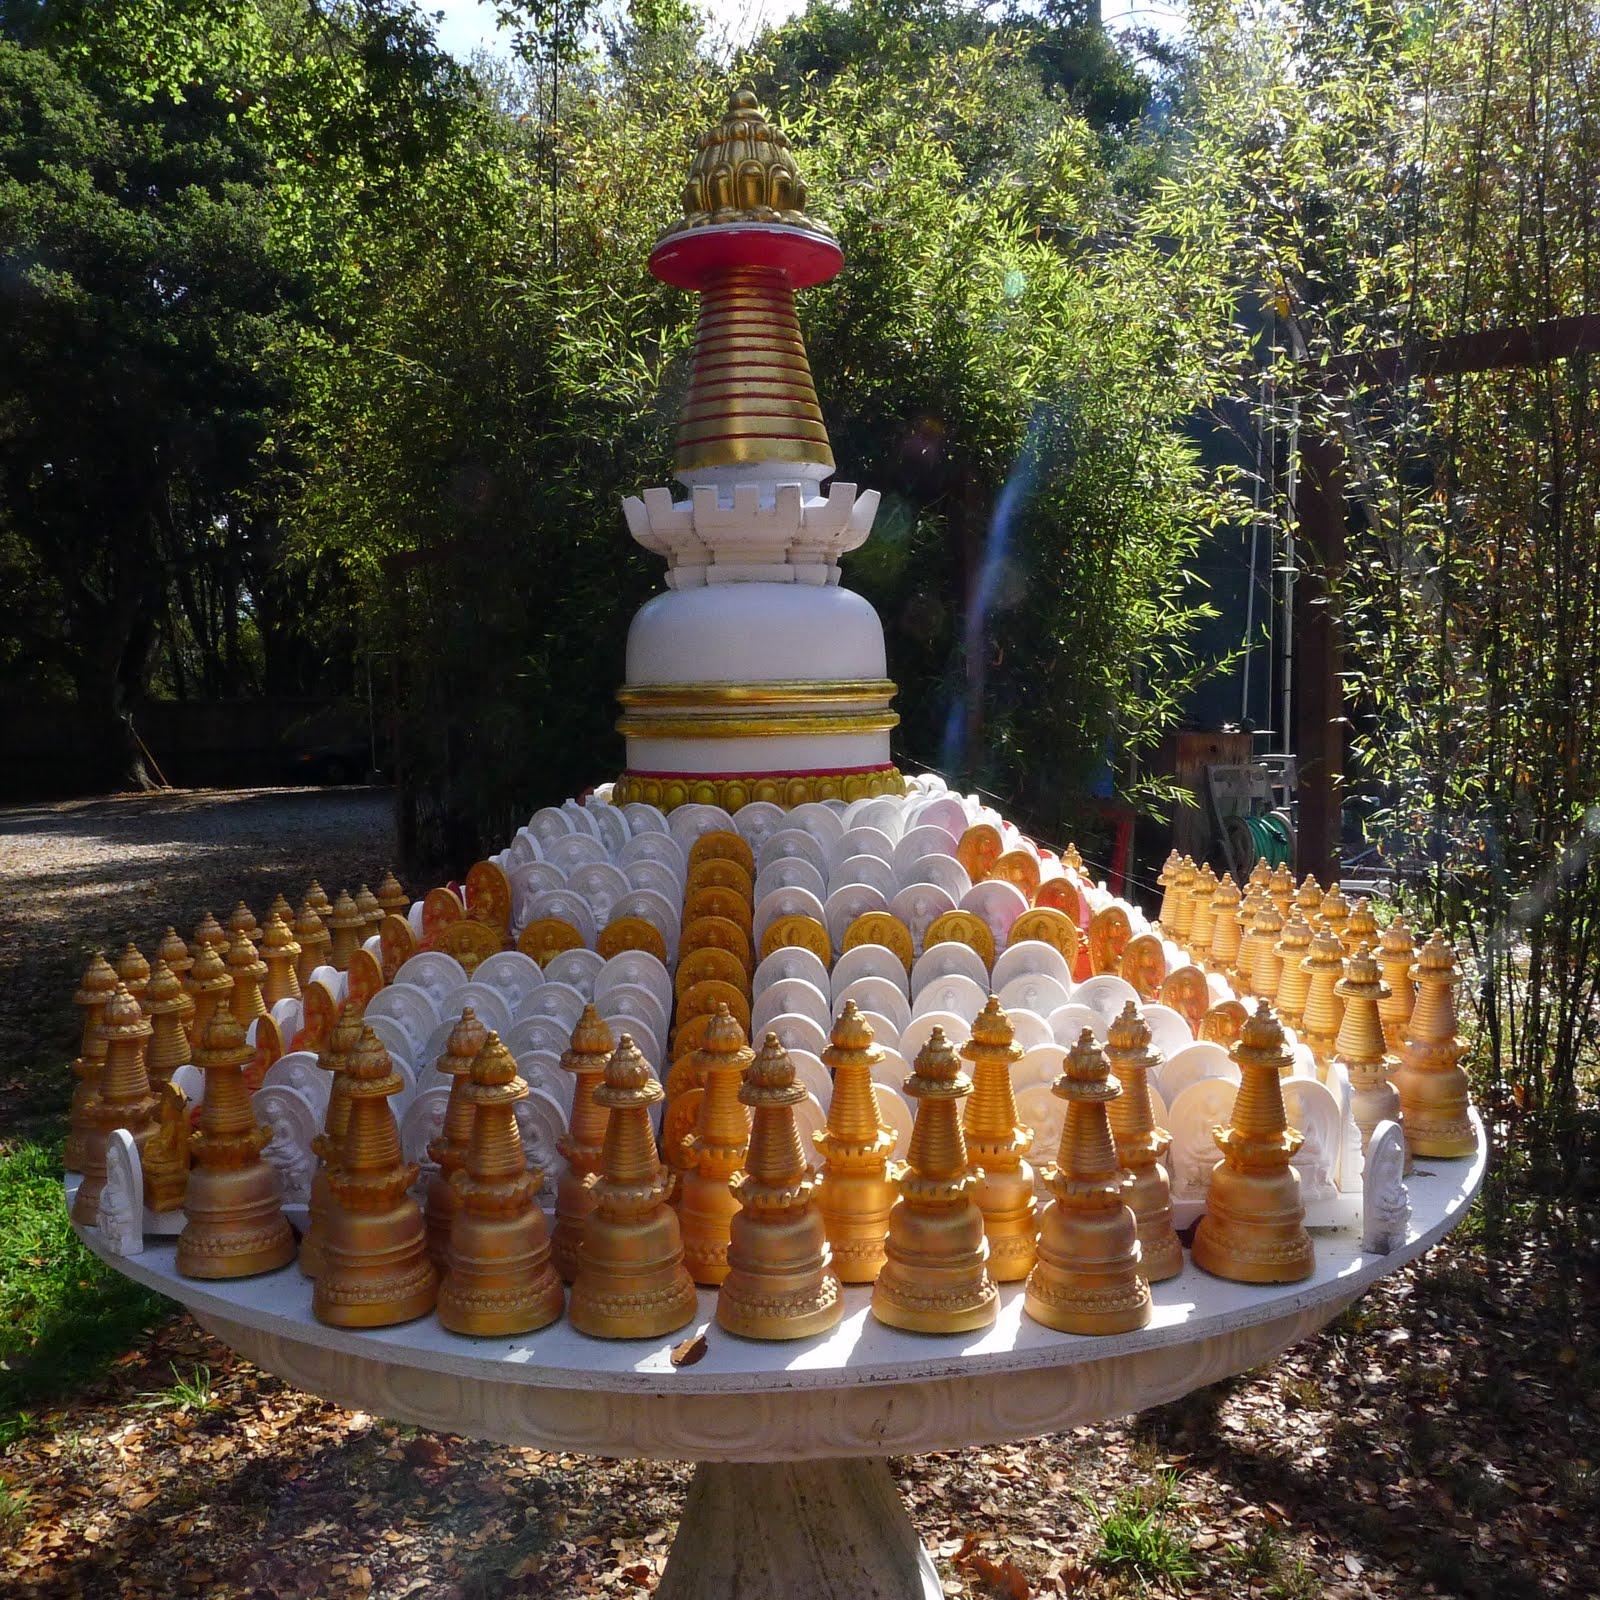 Tables of small Kadampa stupas to circumambulate at Kachoe Dechen Ling, Aptos, CA, USA.